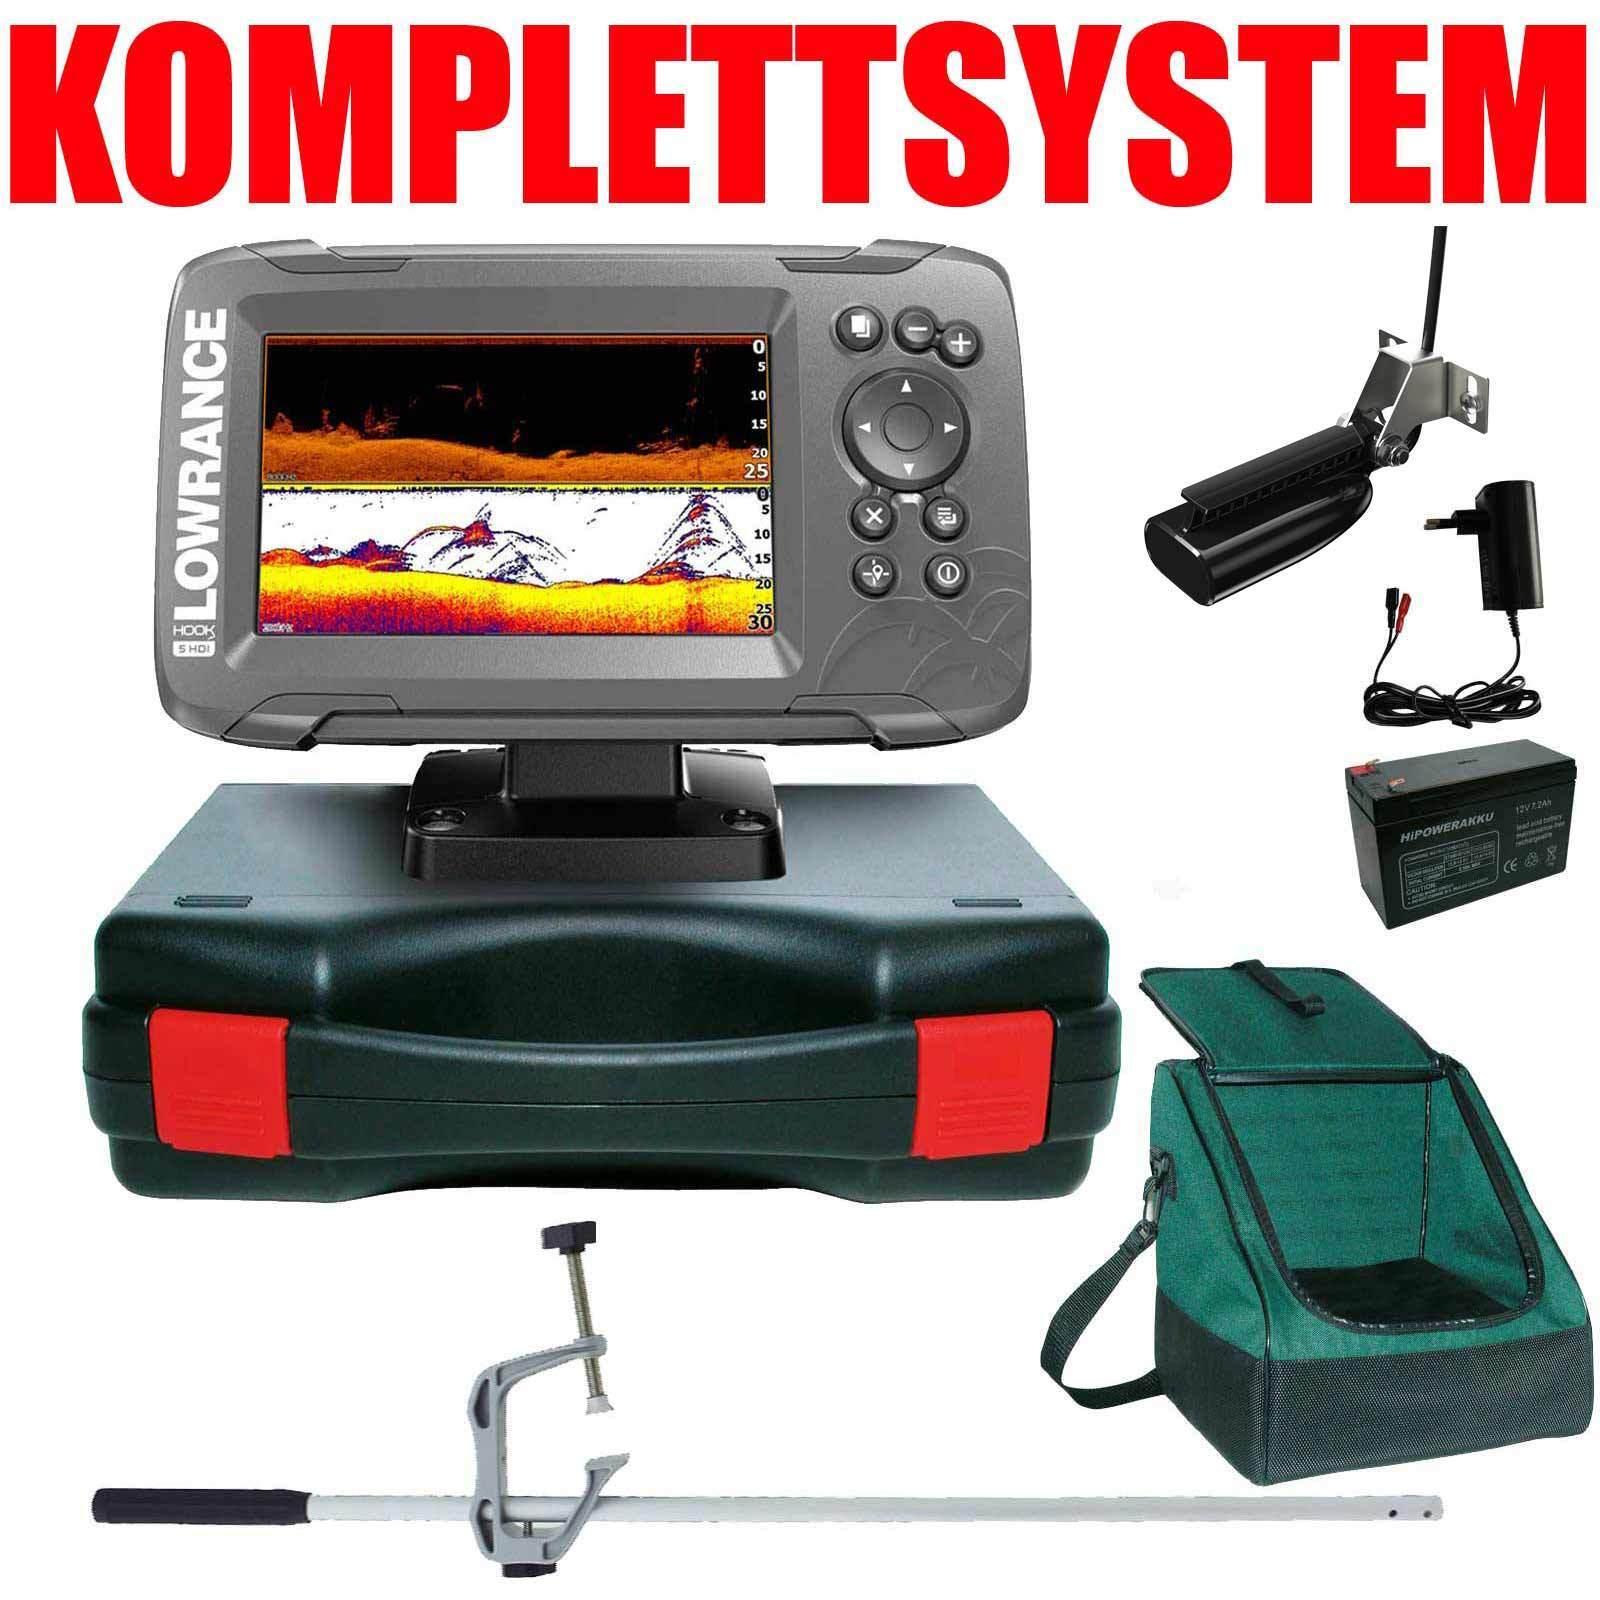 Niedrigrance Echolot GPS Portabel Master Plus Hook2 5 GPS SplitShot HDI CHIRP Combo GPS 5 f89177